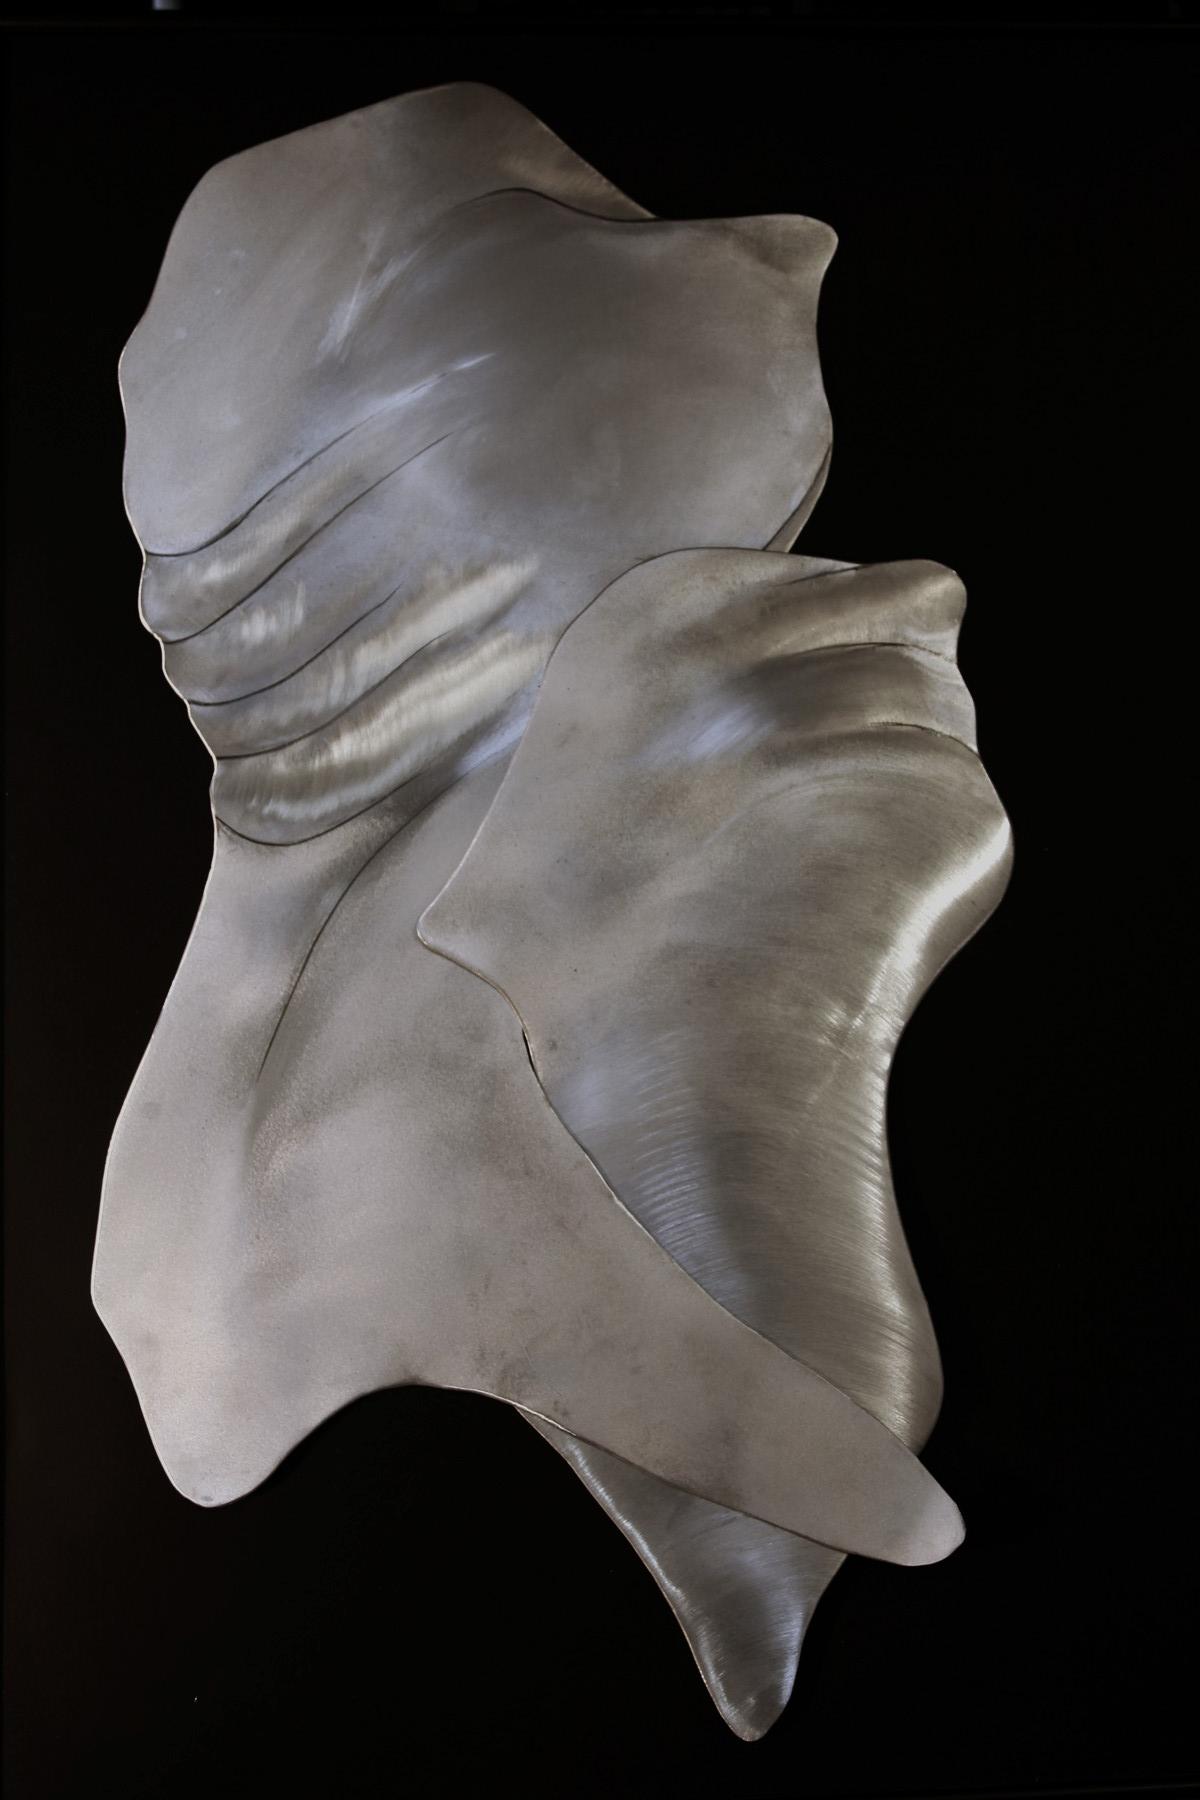 "Herb Rosenberg ""The One Percenters"" Aluminum, 30"" x 40"" x 1/4"", 2013"